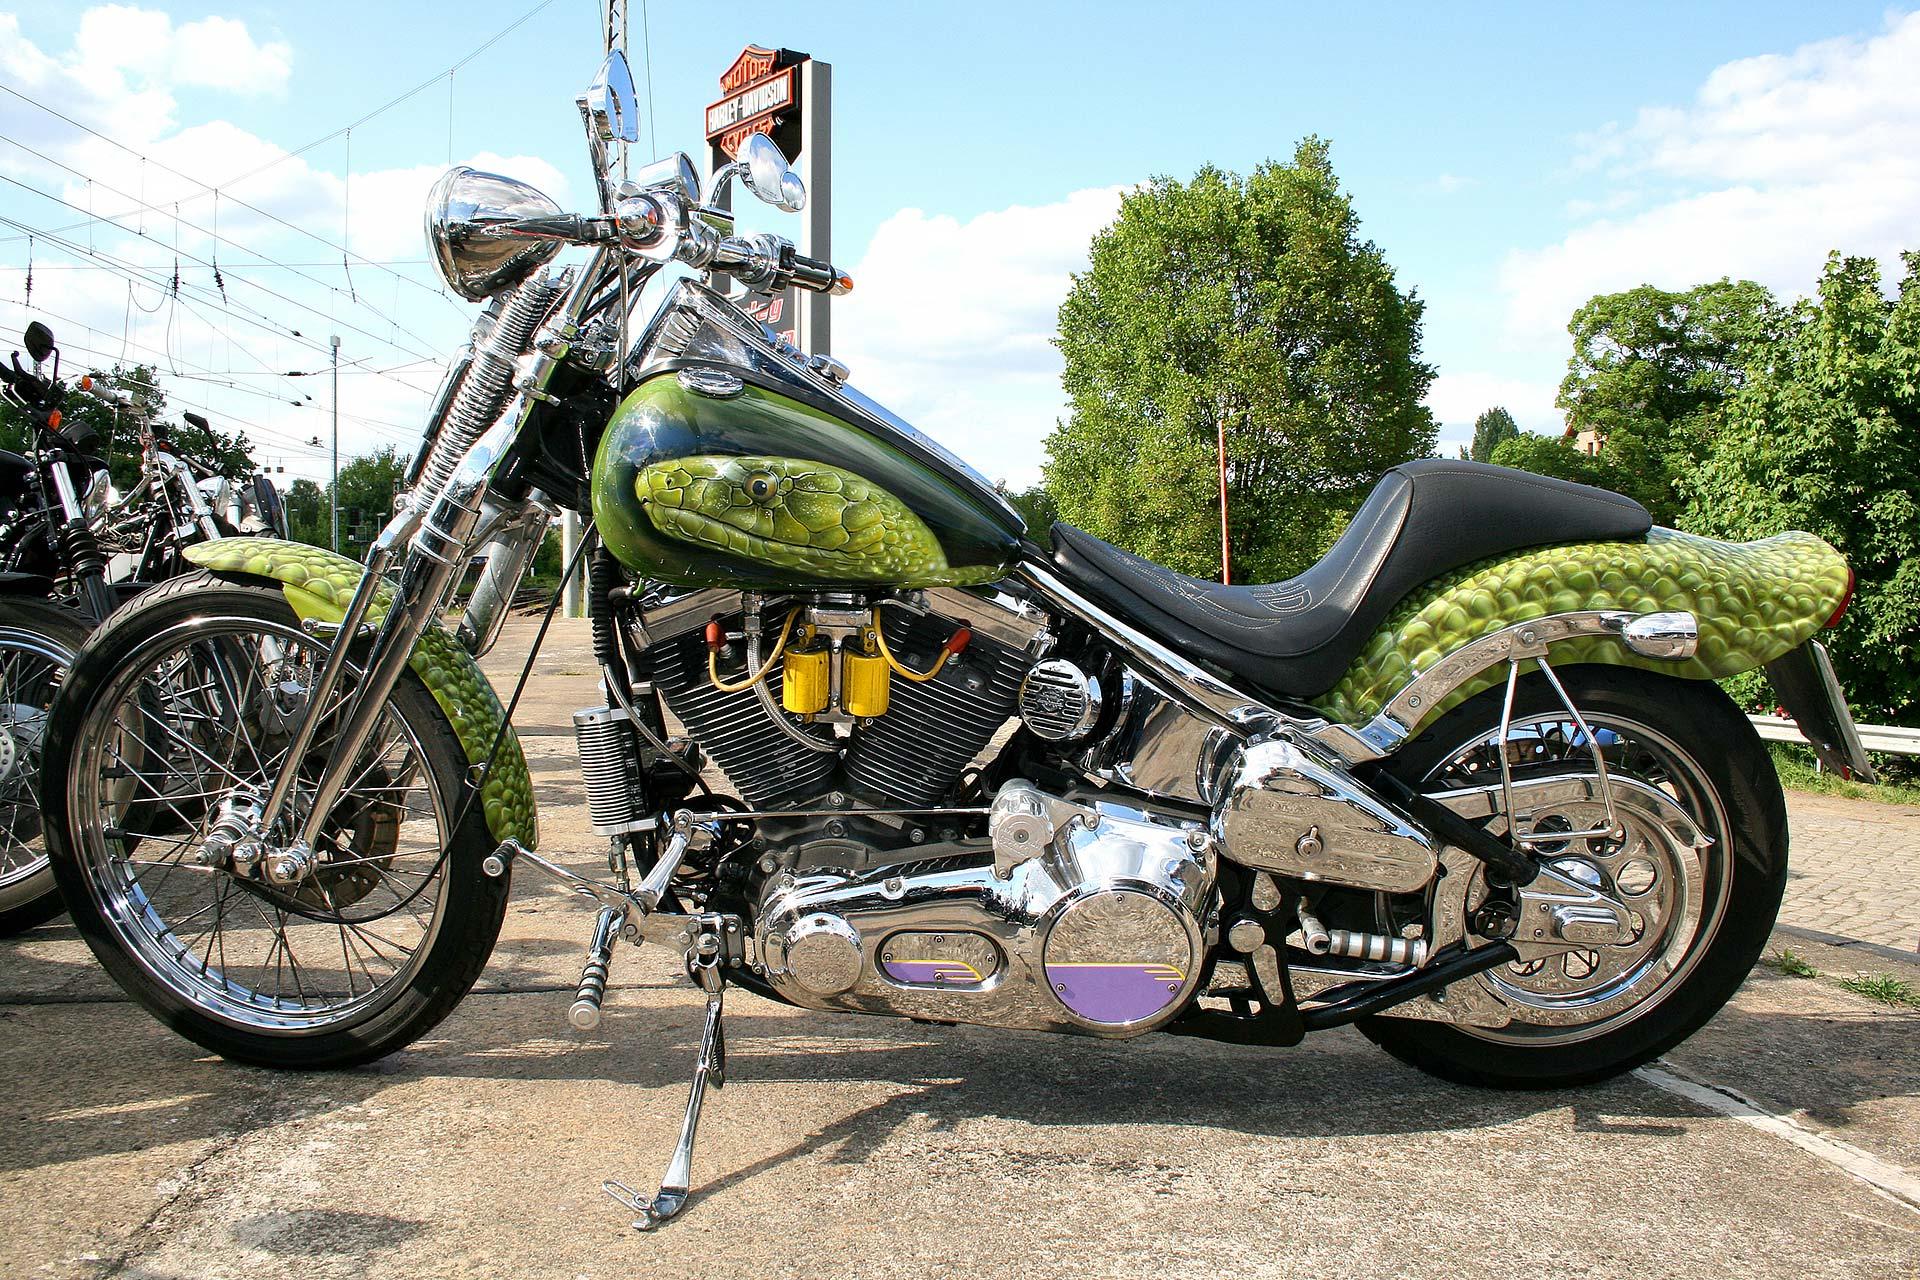 Mamba Harley